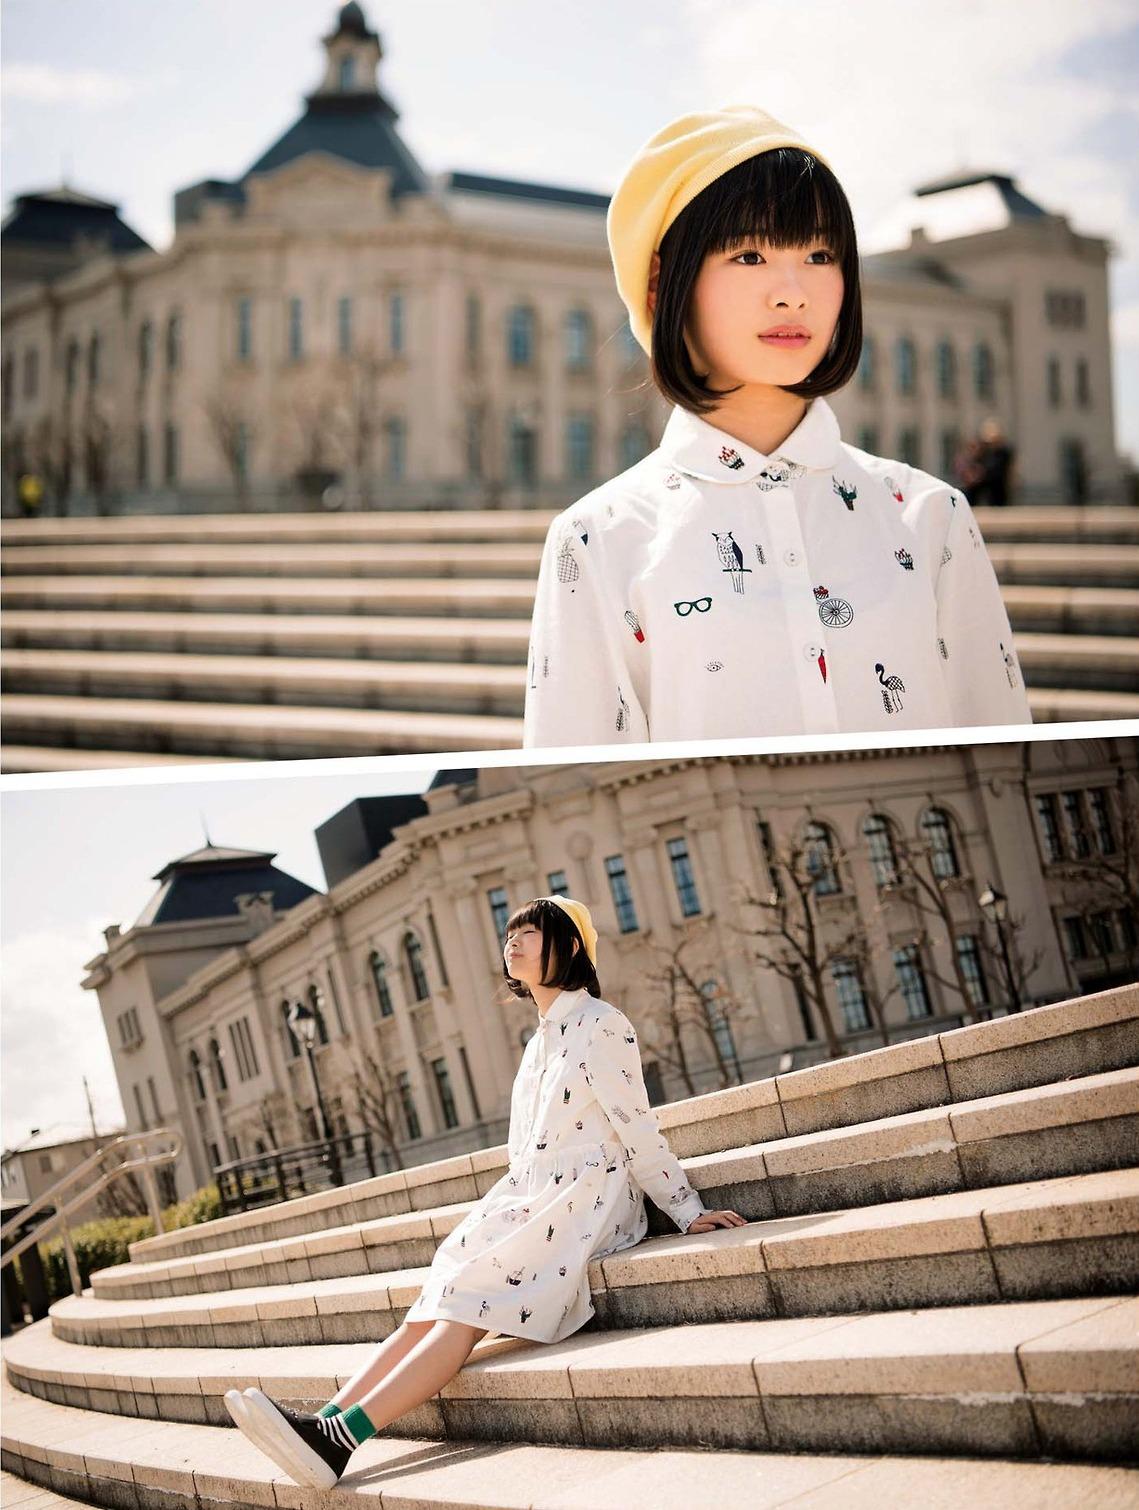 Takakura Moeka 高倉萌香 NGT48, My Girl 2017 Vol.17 別冊CD&DLでーた